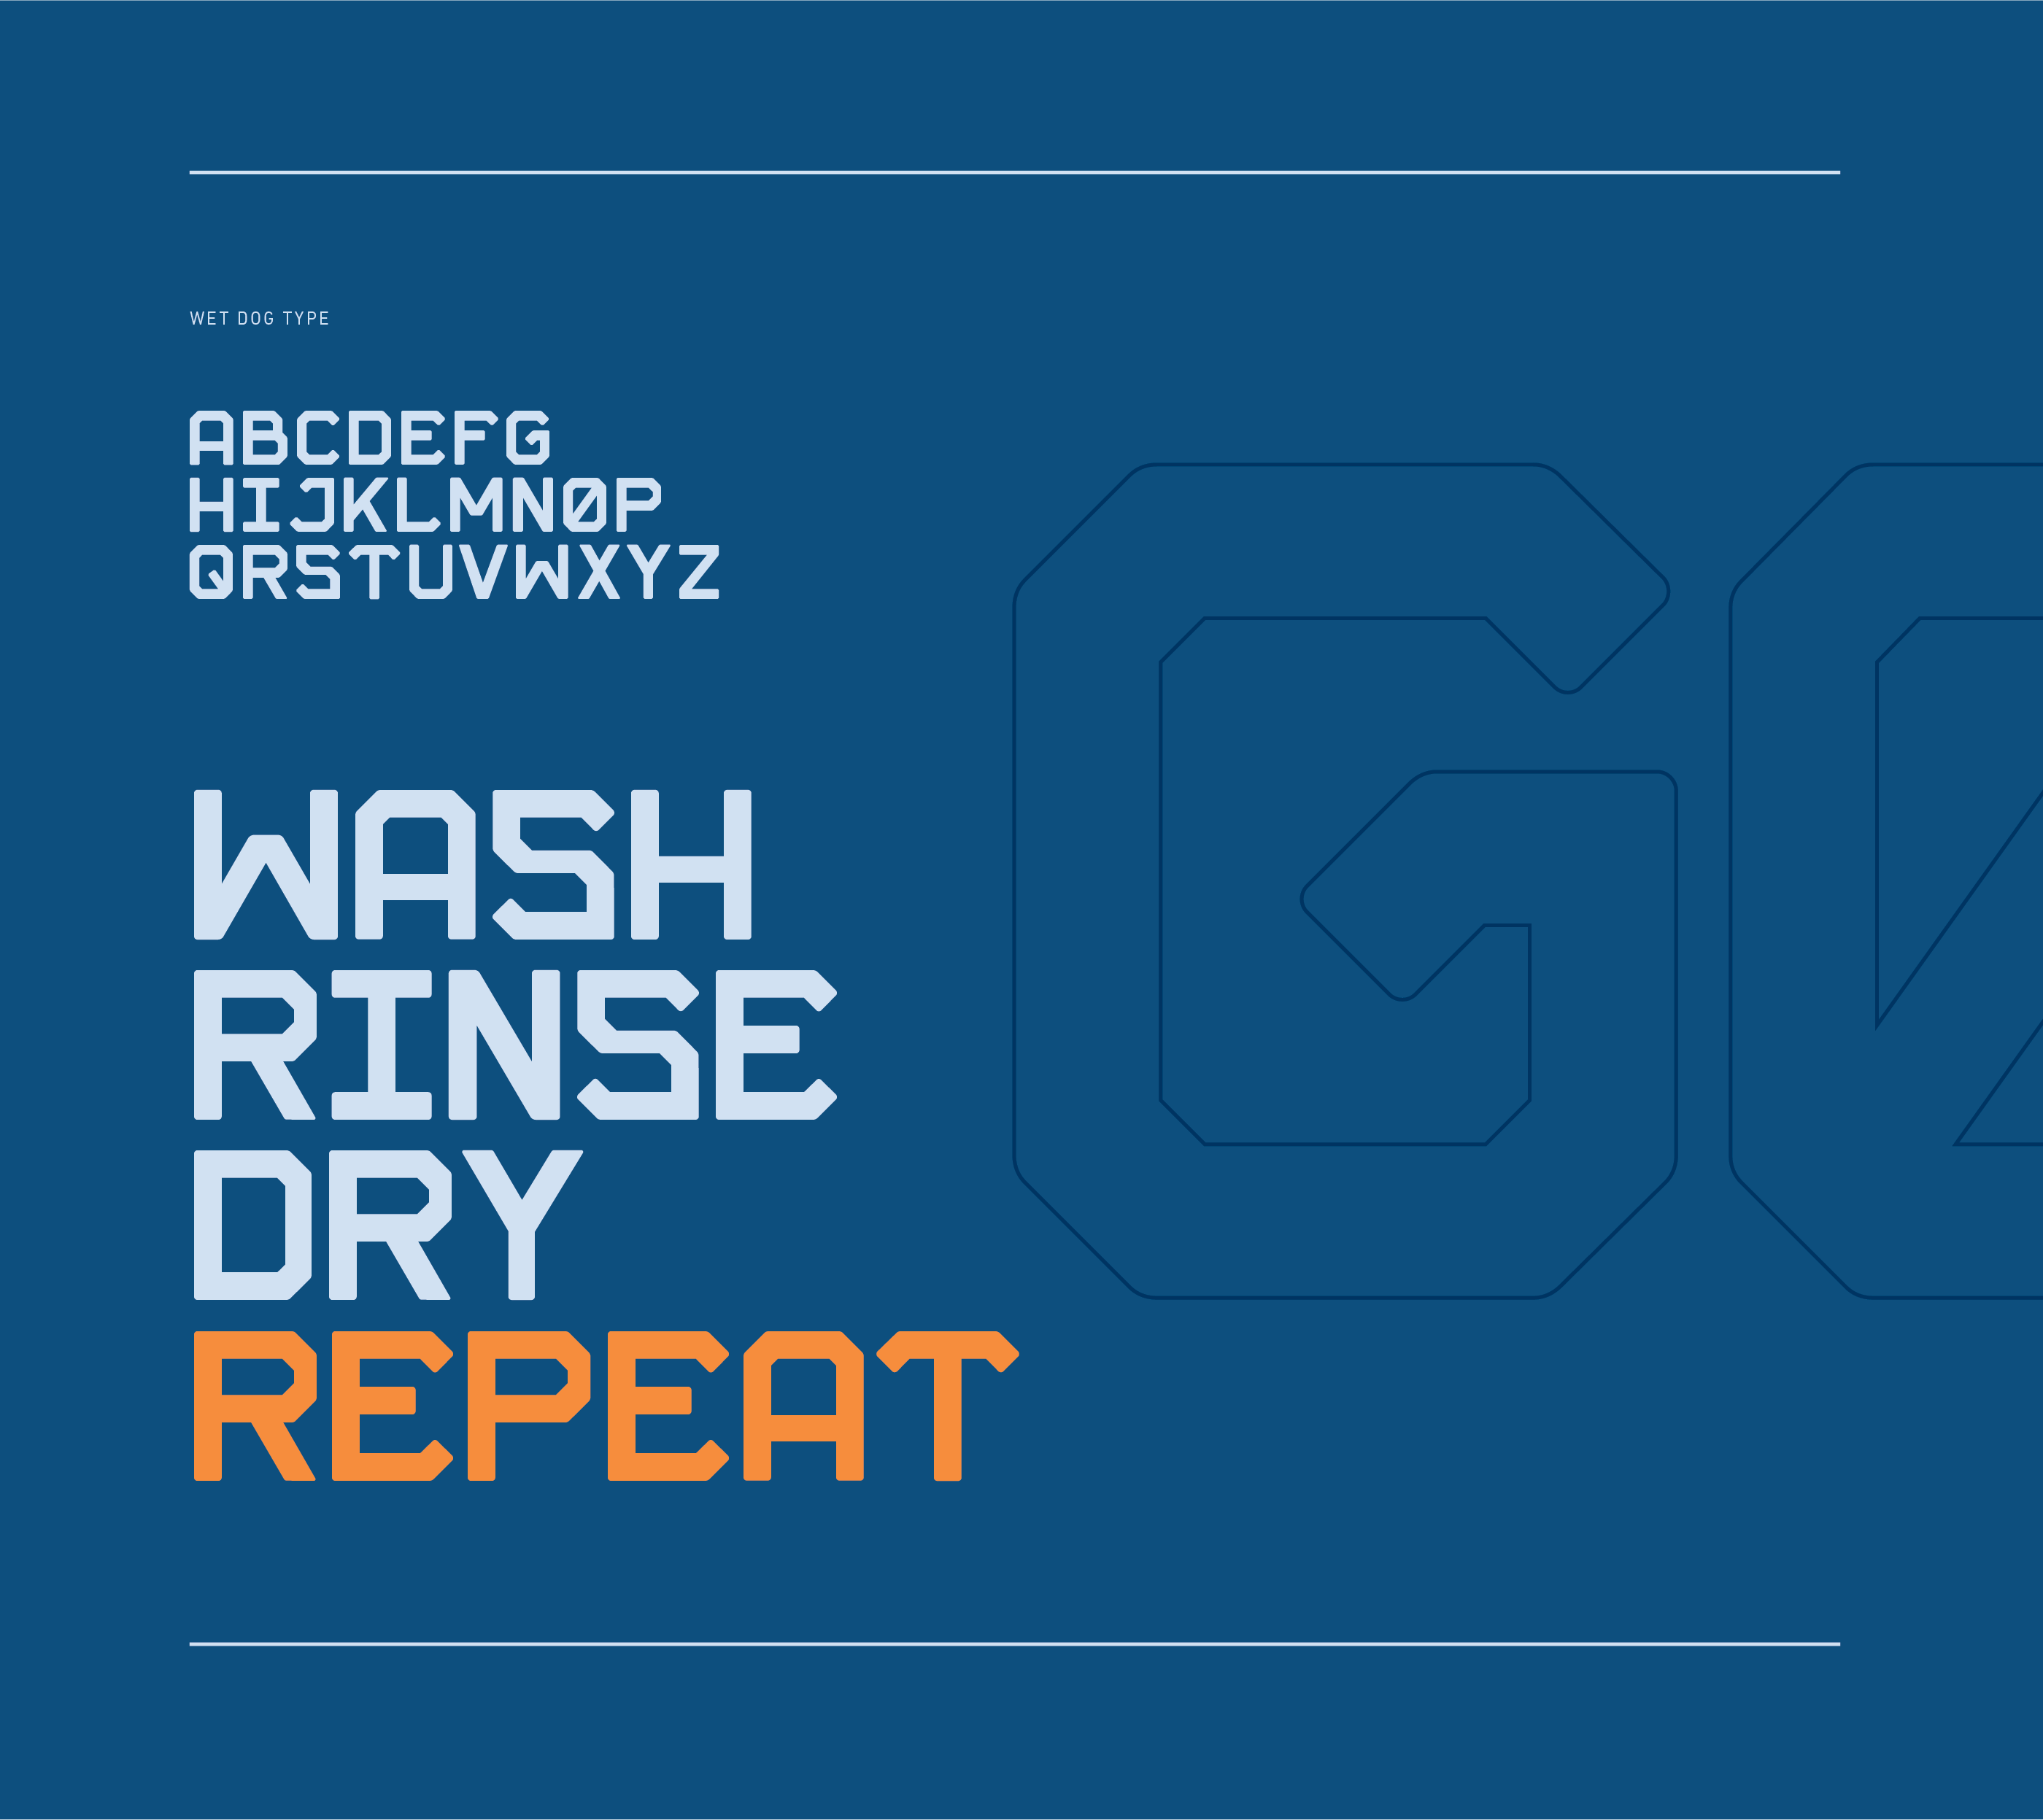 WetDog_Behance_Typeface-04